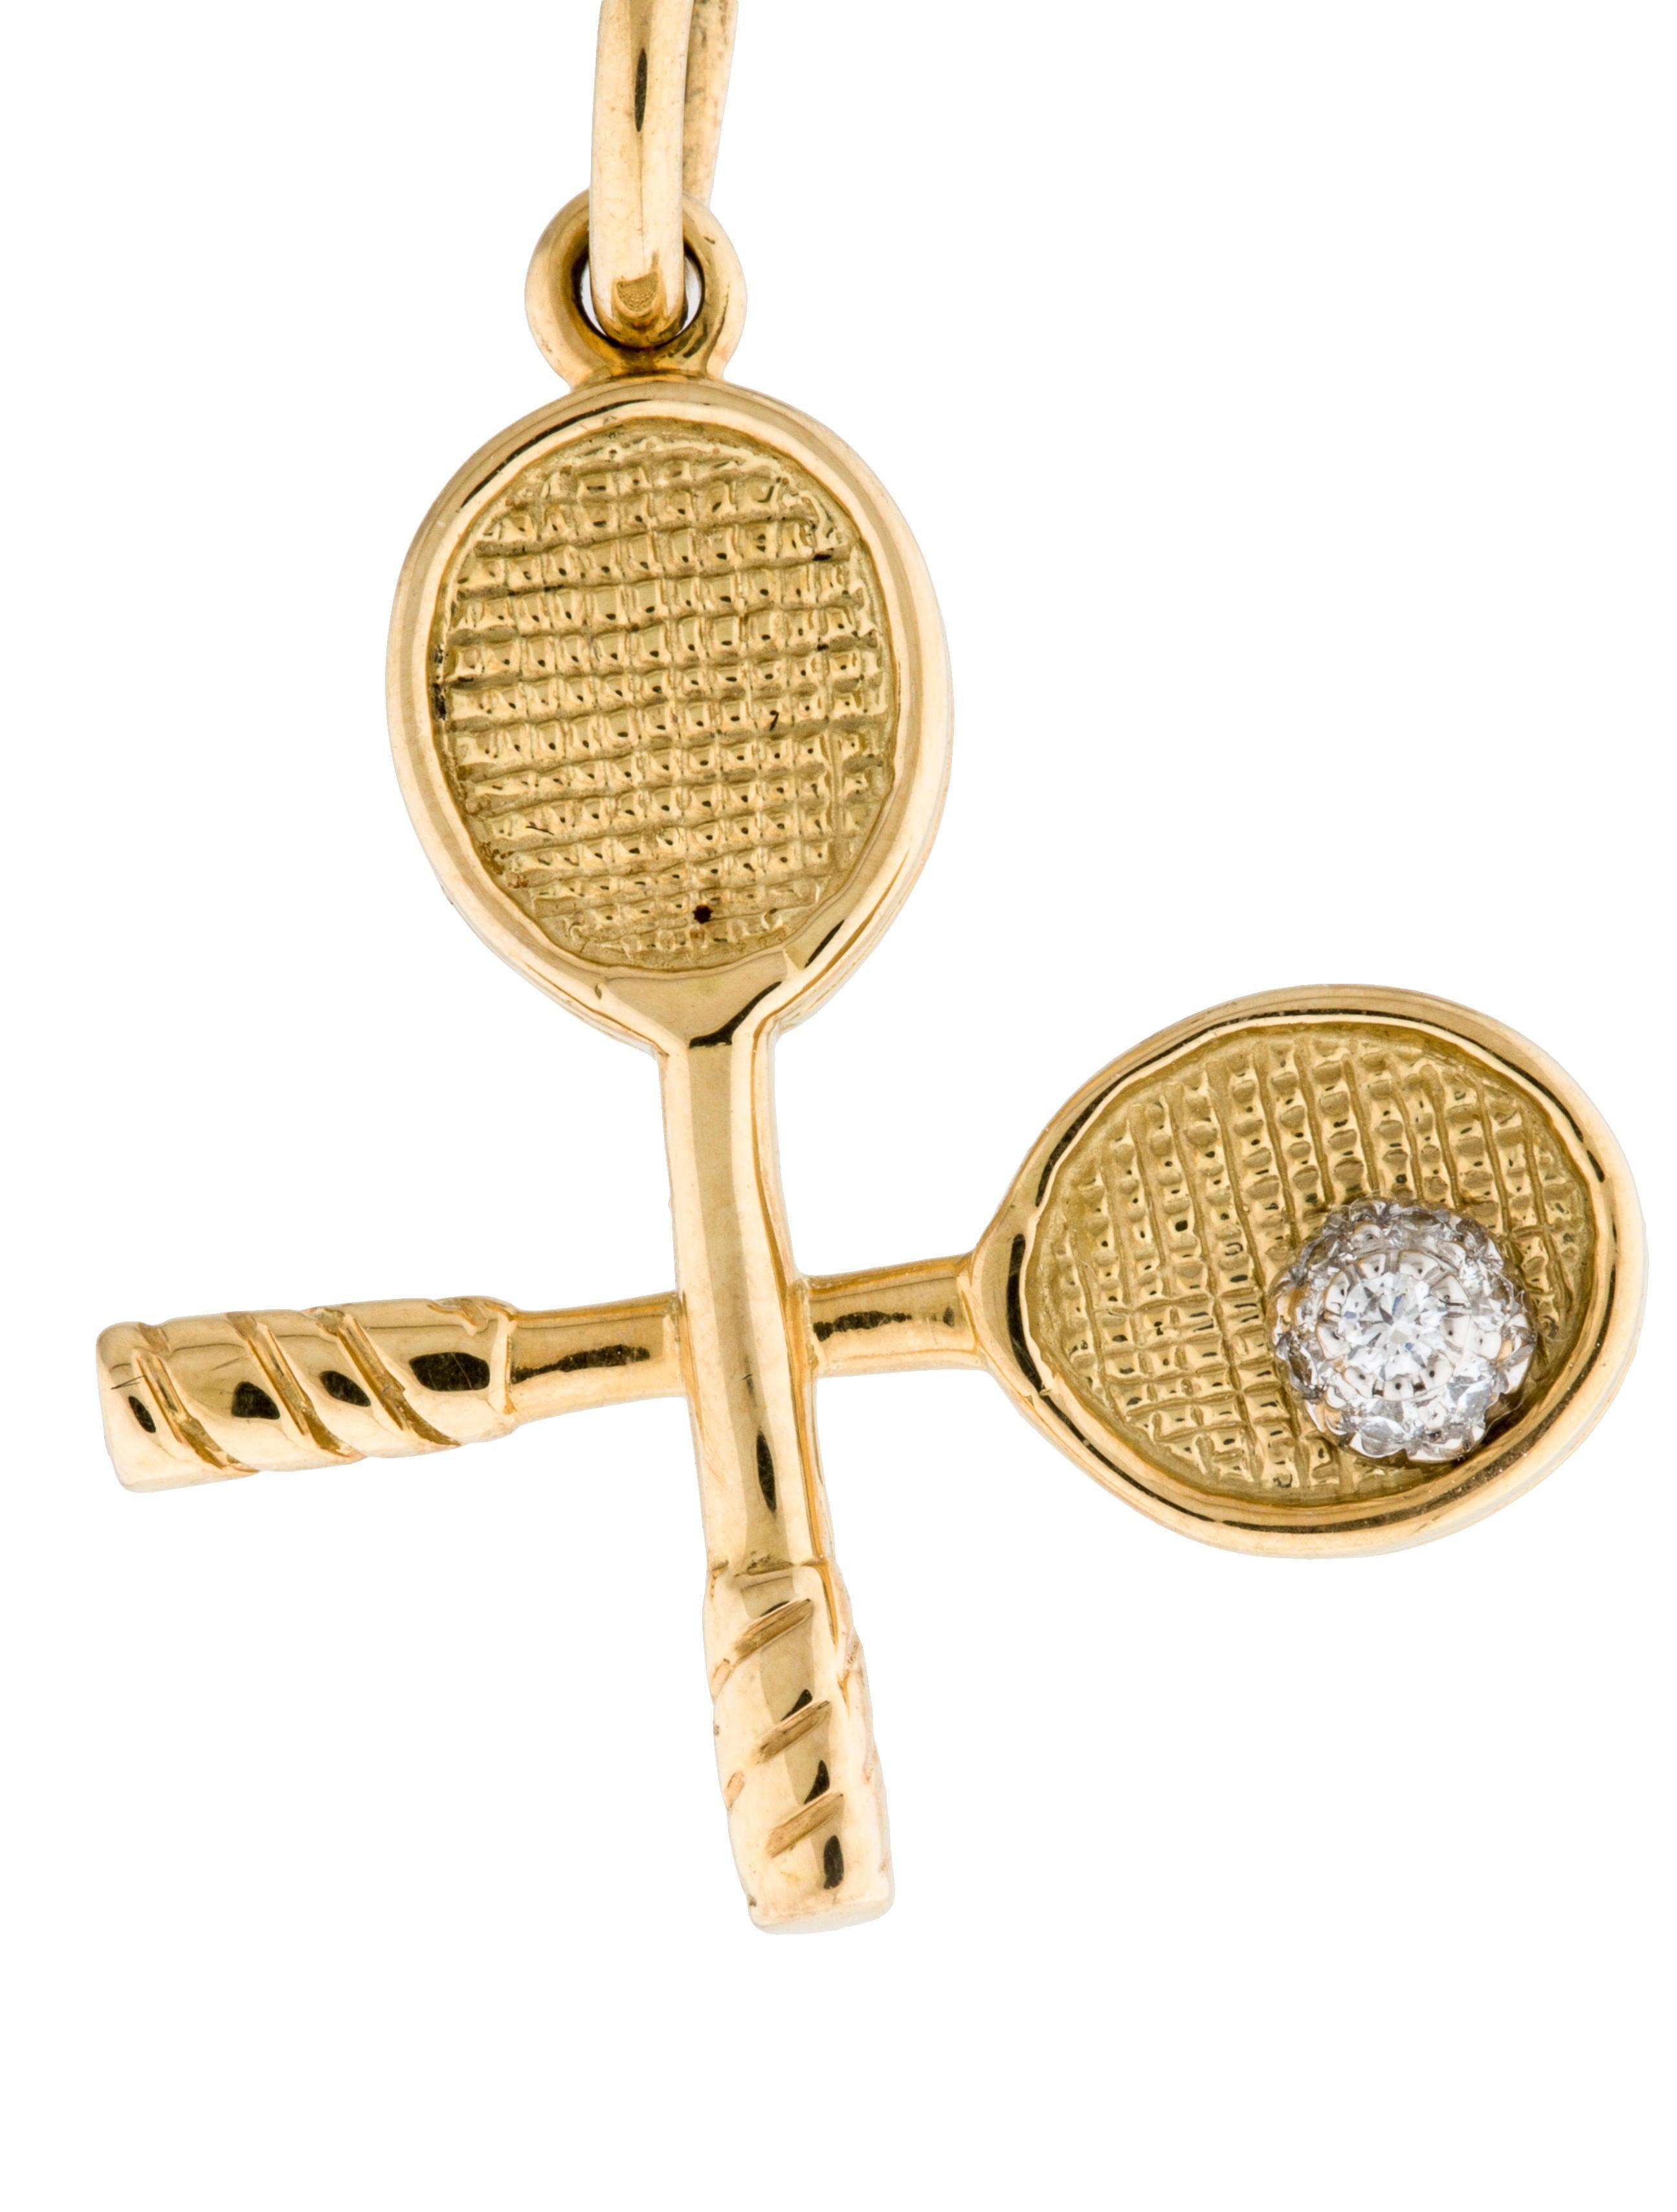 Tiffany co diamond tennis racquet charm charms tif48789 diamond tennis racquet charm aloadofball Images